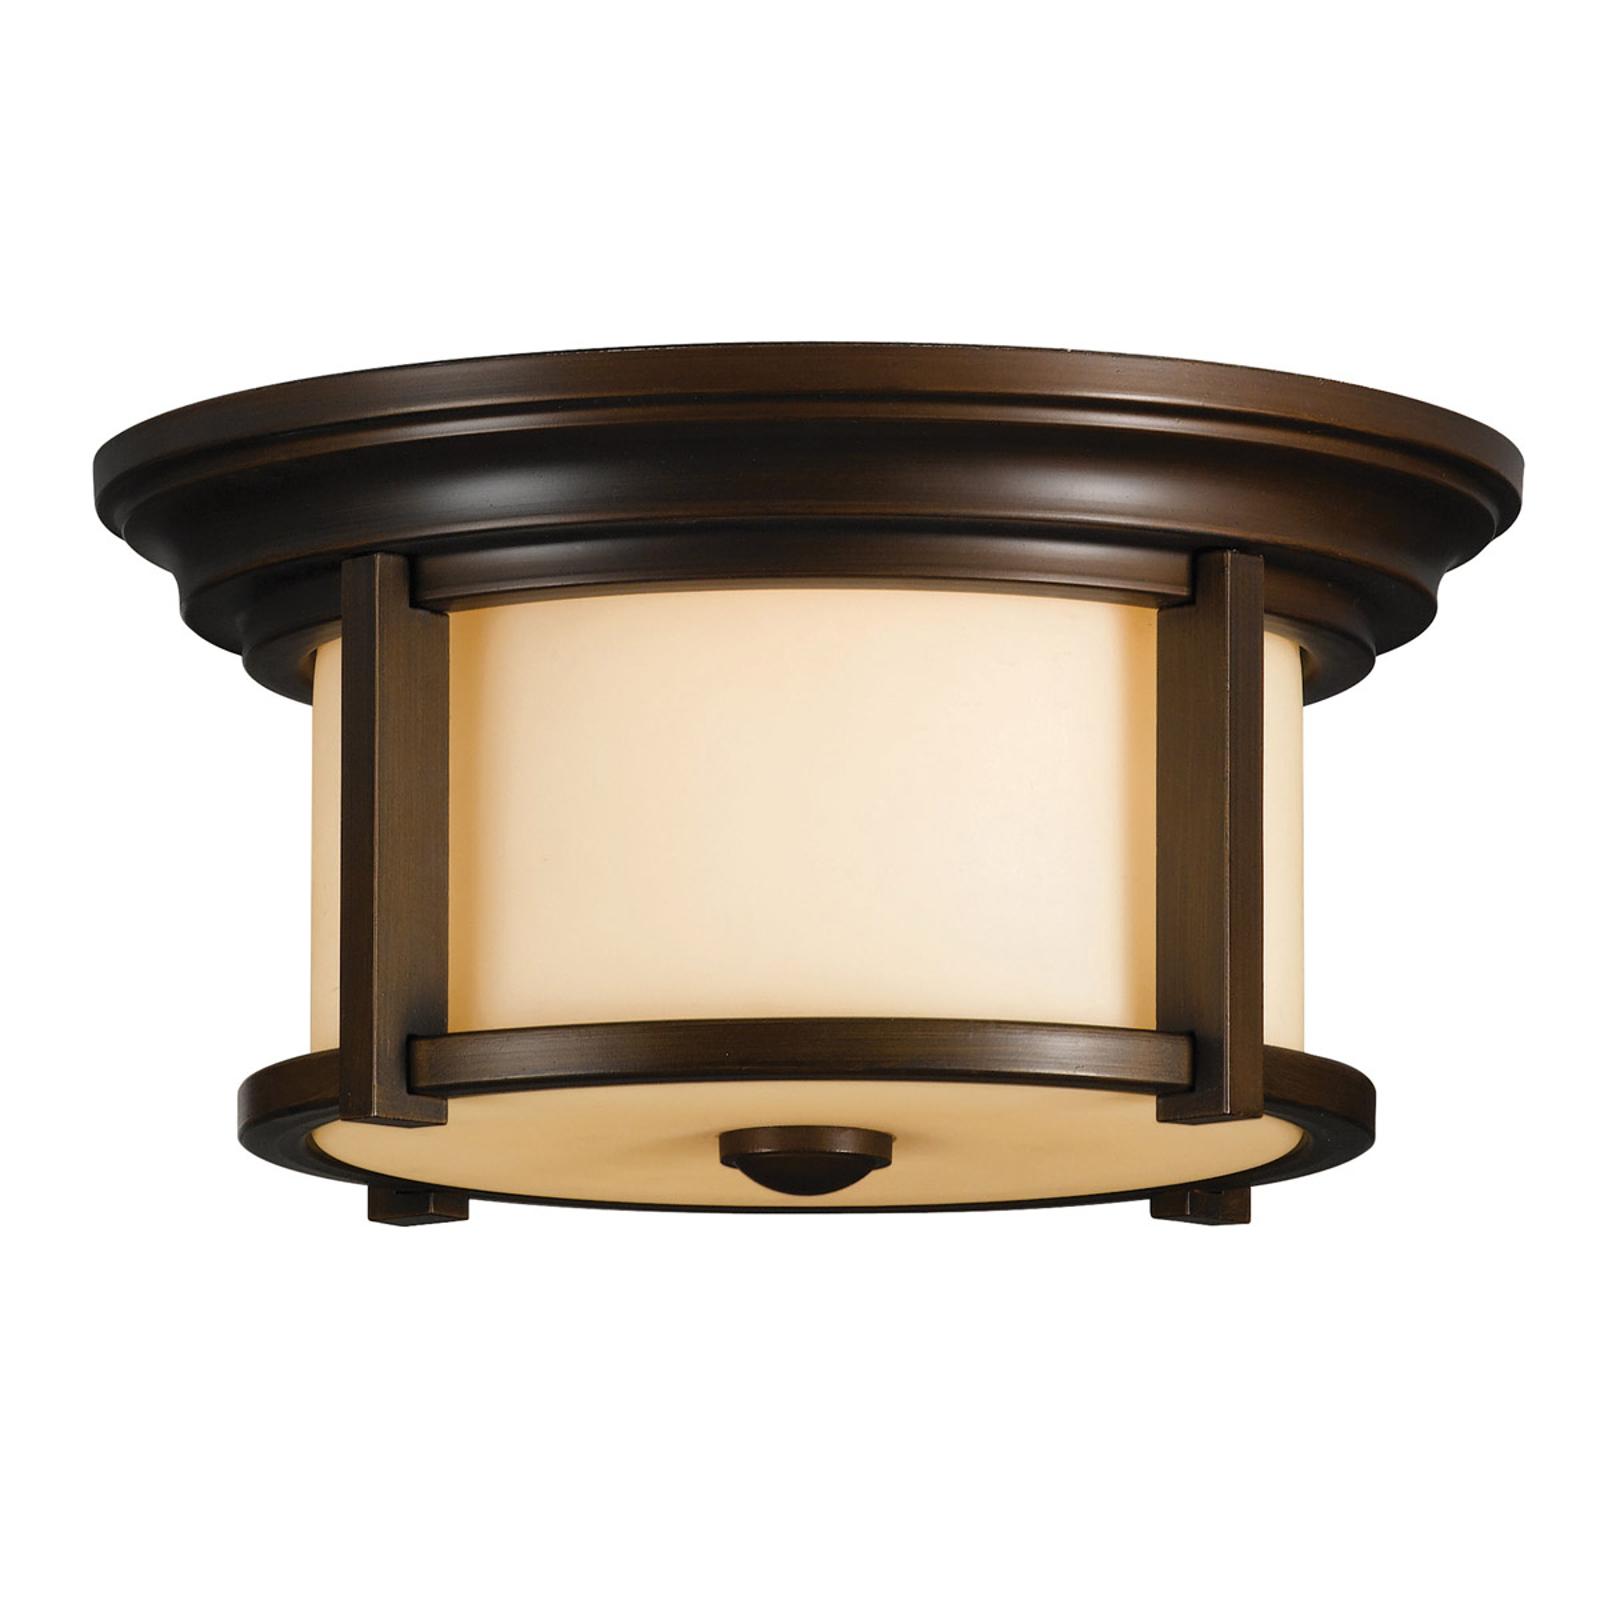 Uniwersalna zewnętrzna lampa sufitowa Merrill